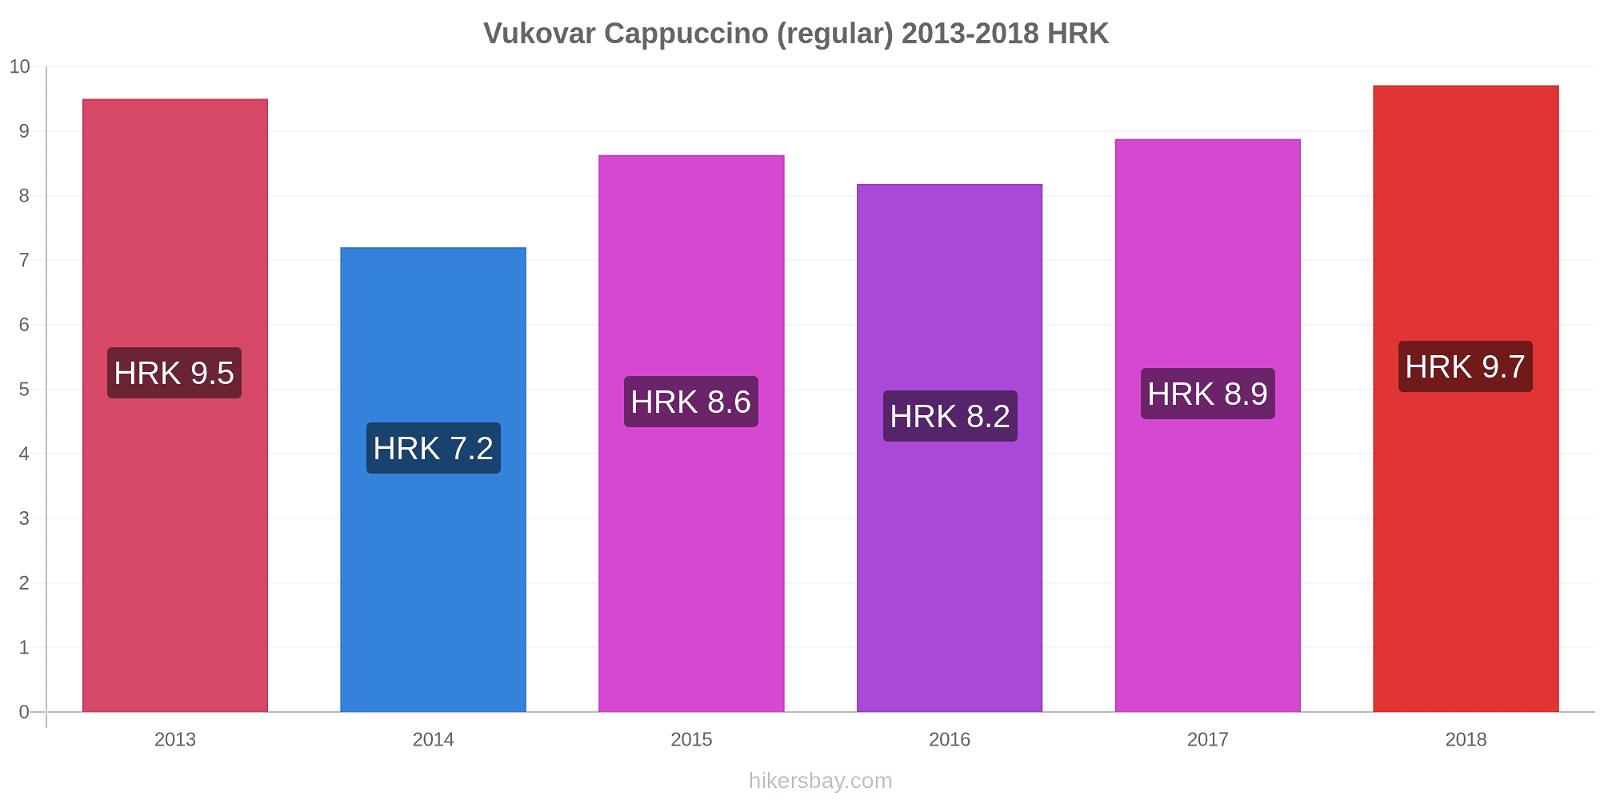 Vukovar price changes Cappuccino (regular) hikersbay.com